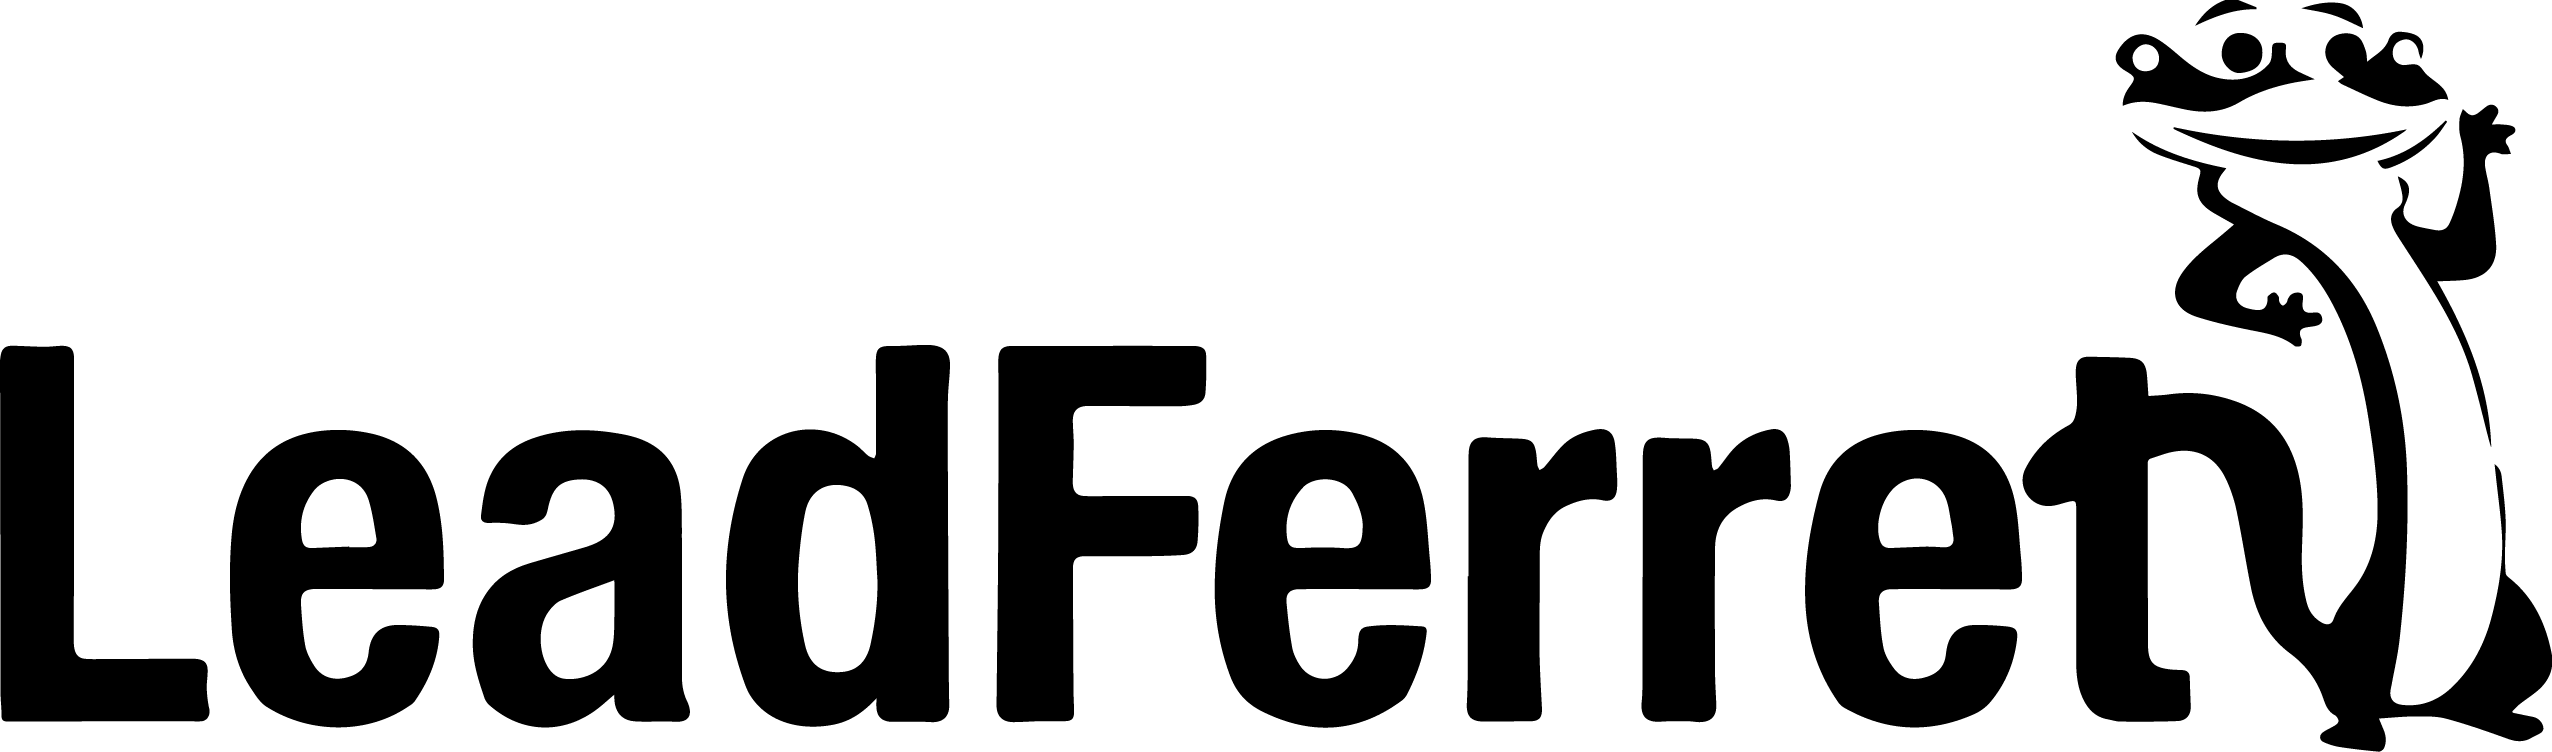 leadferret